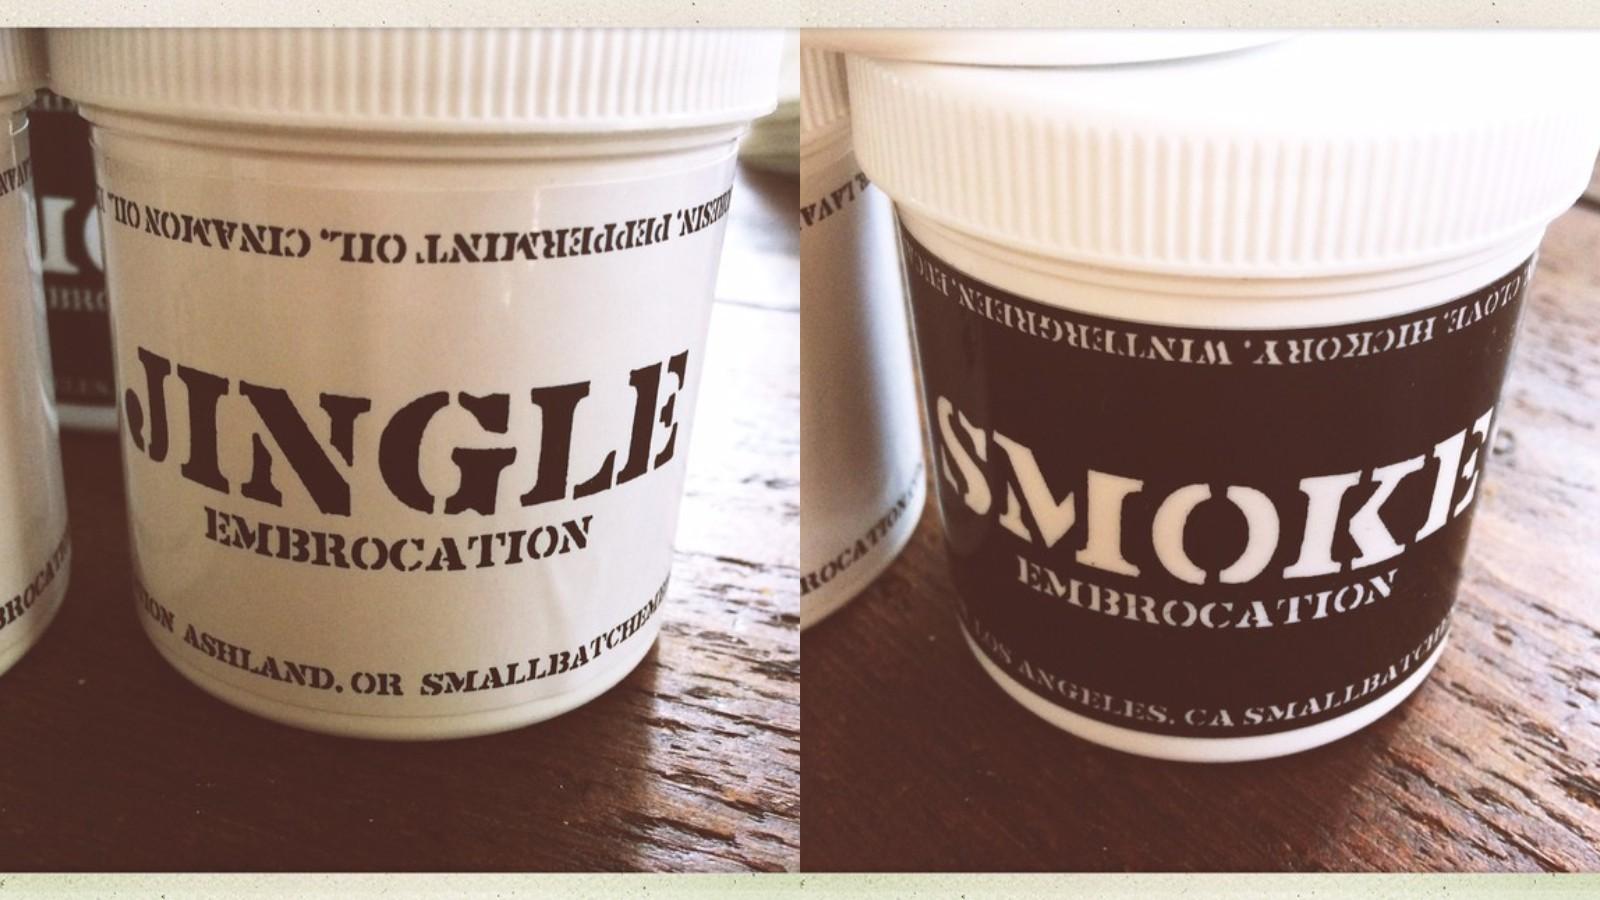 Small Batch Embrocation's Jingle and Smoke